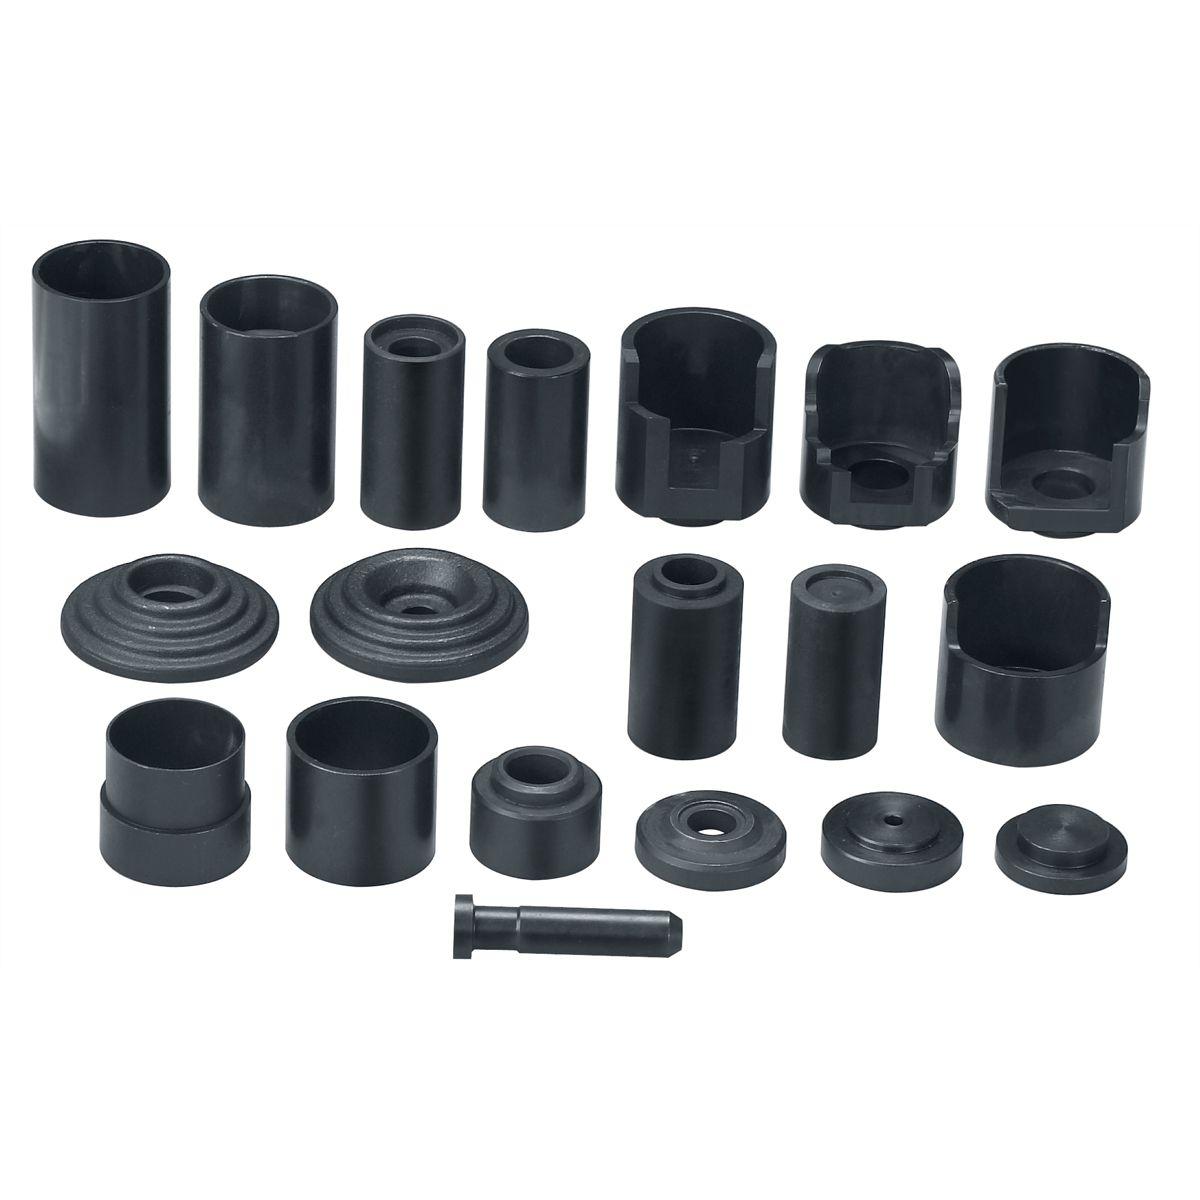 Honda/Acura Car Ball Joint Adapter Set